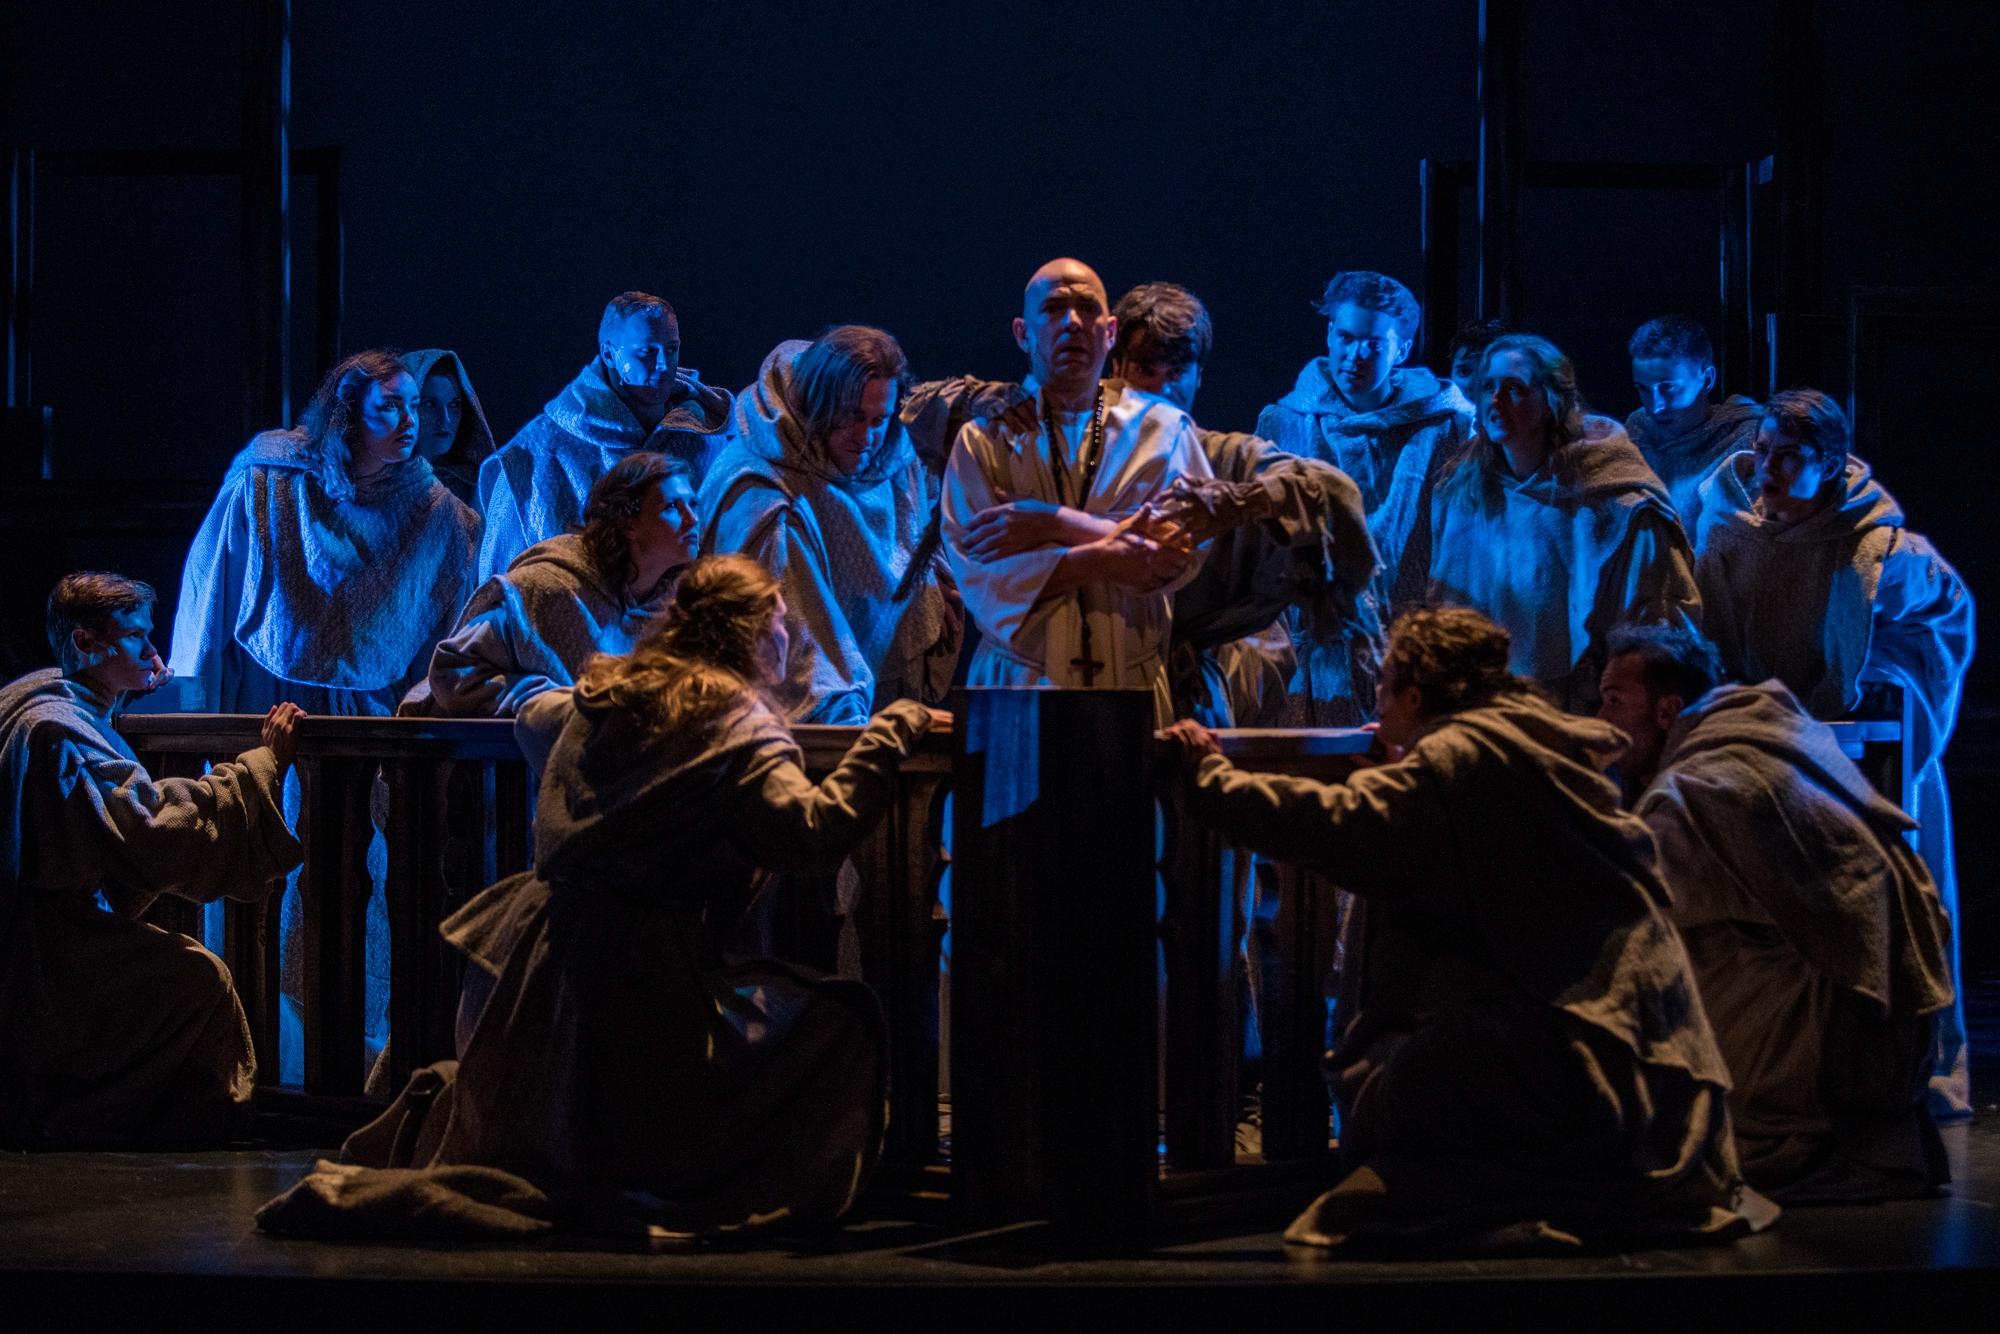 hunchback-blog-toronto-theatre-musical_0004.jpg